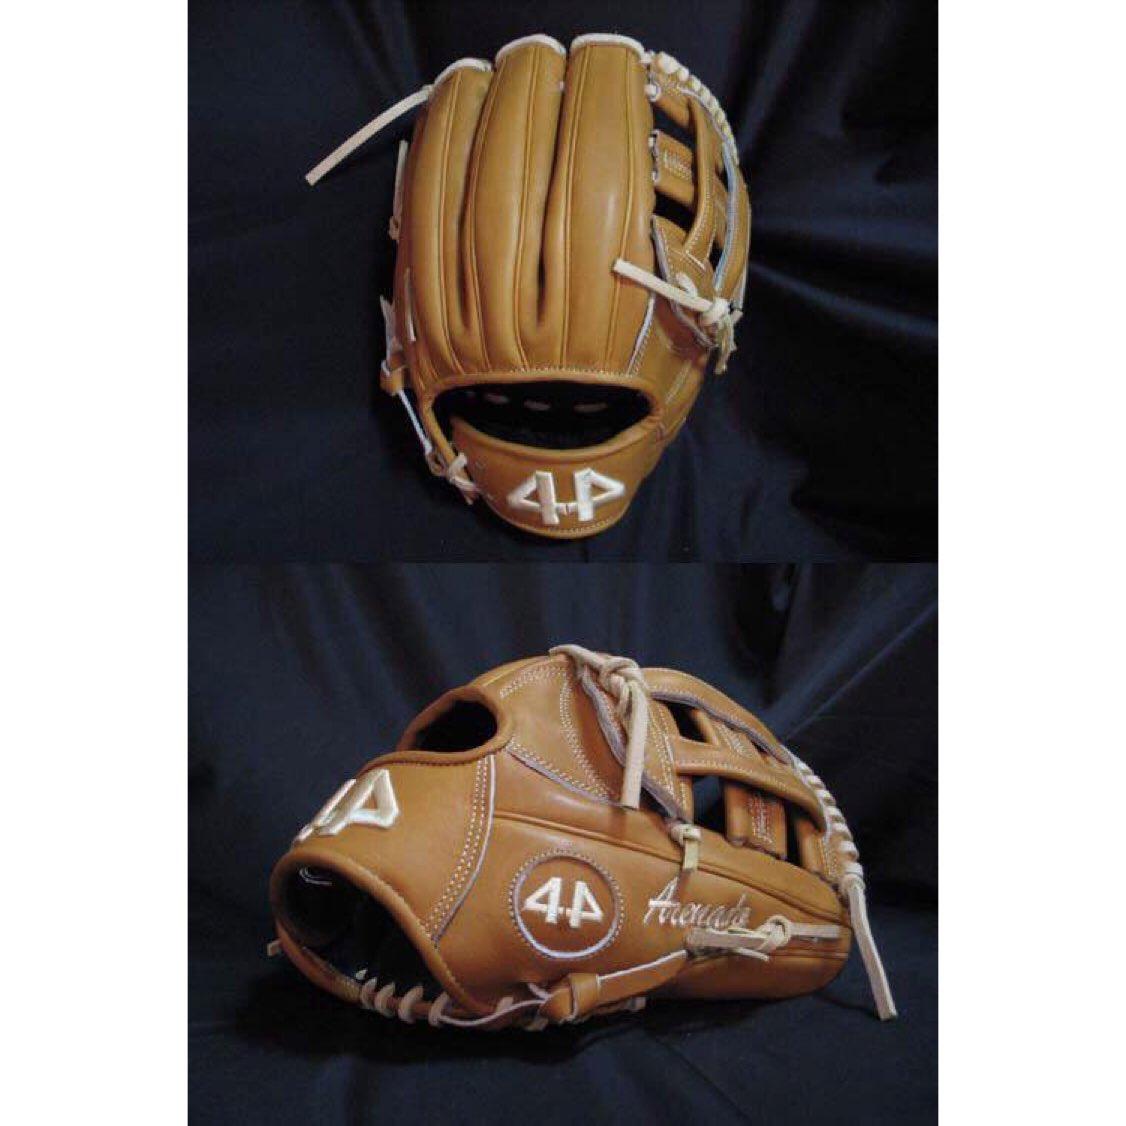 44 Pro Gloves Dual Welting